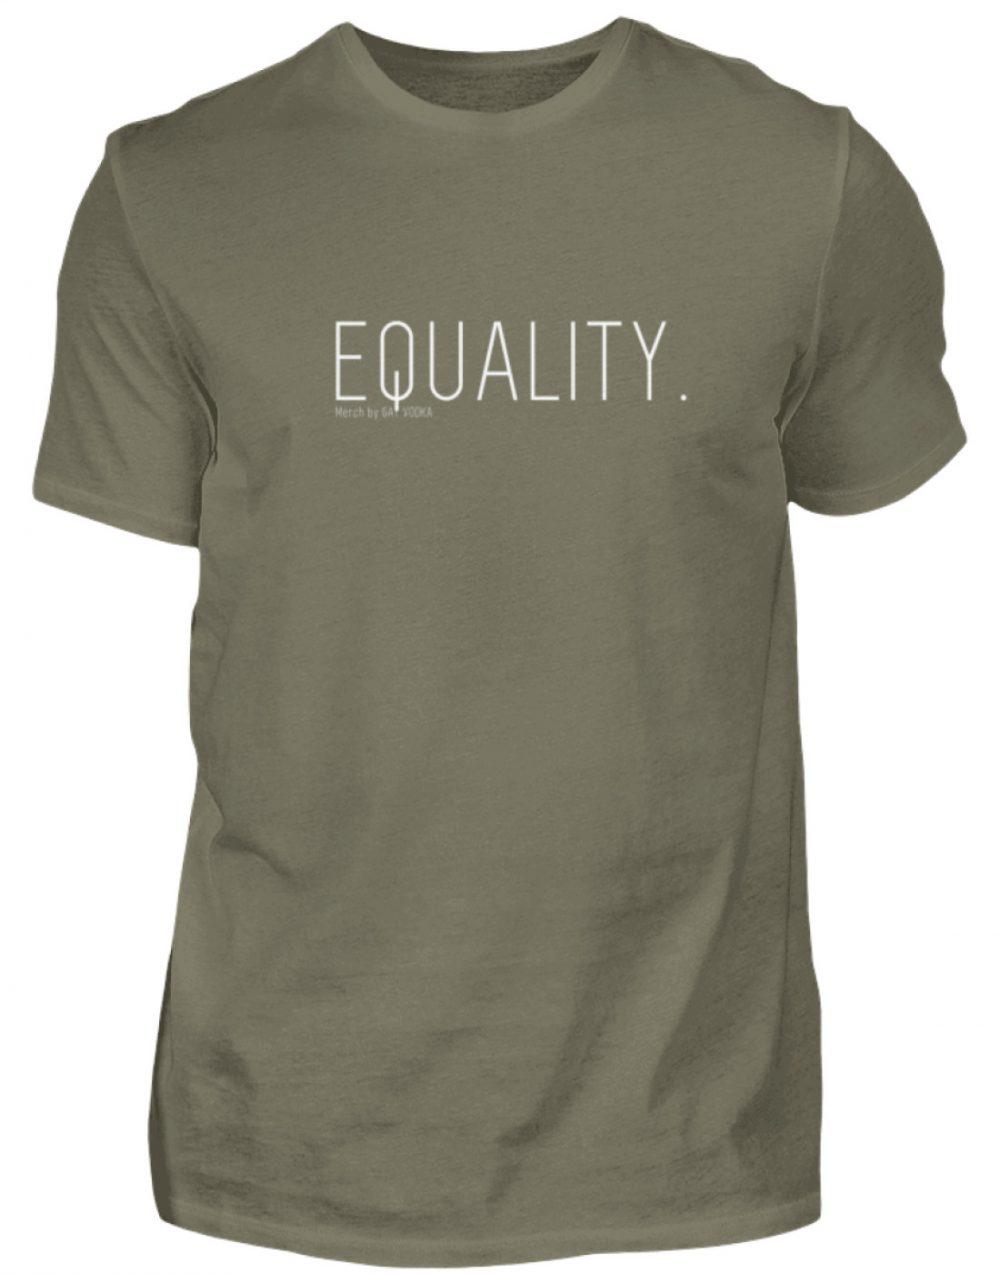 EQUALITY. - Herren Premiumshirt-627